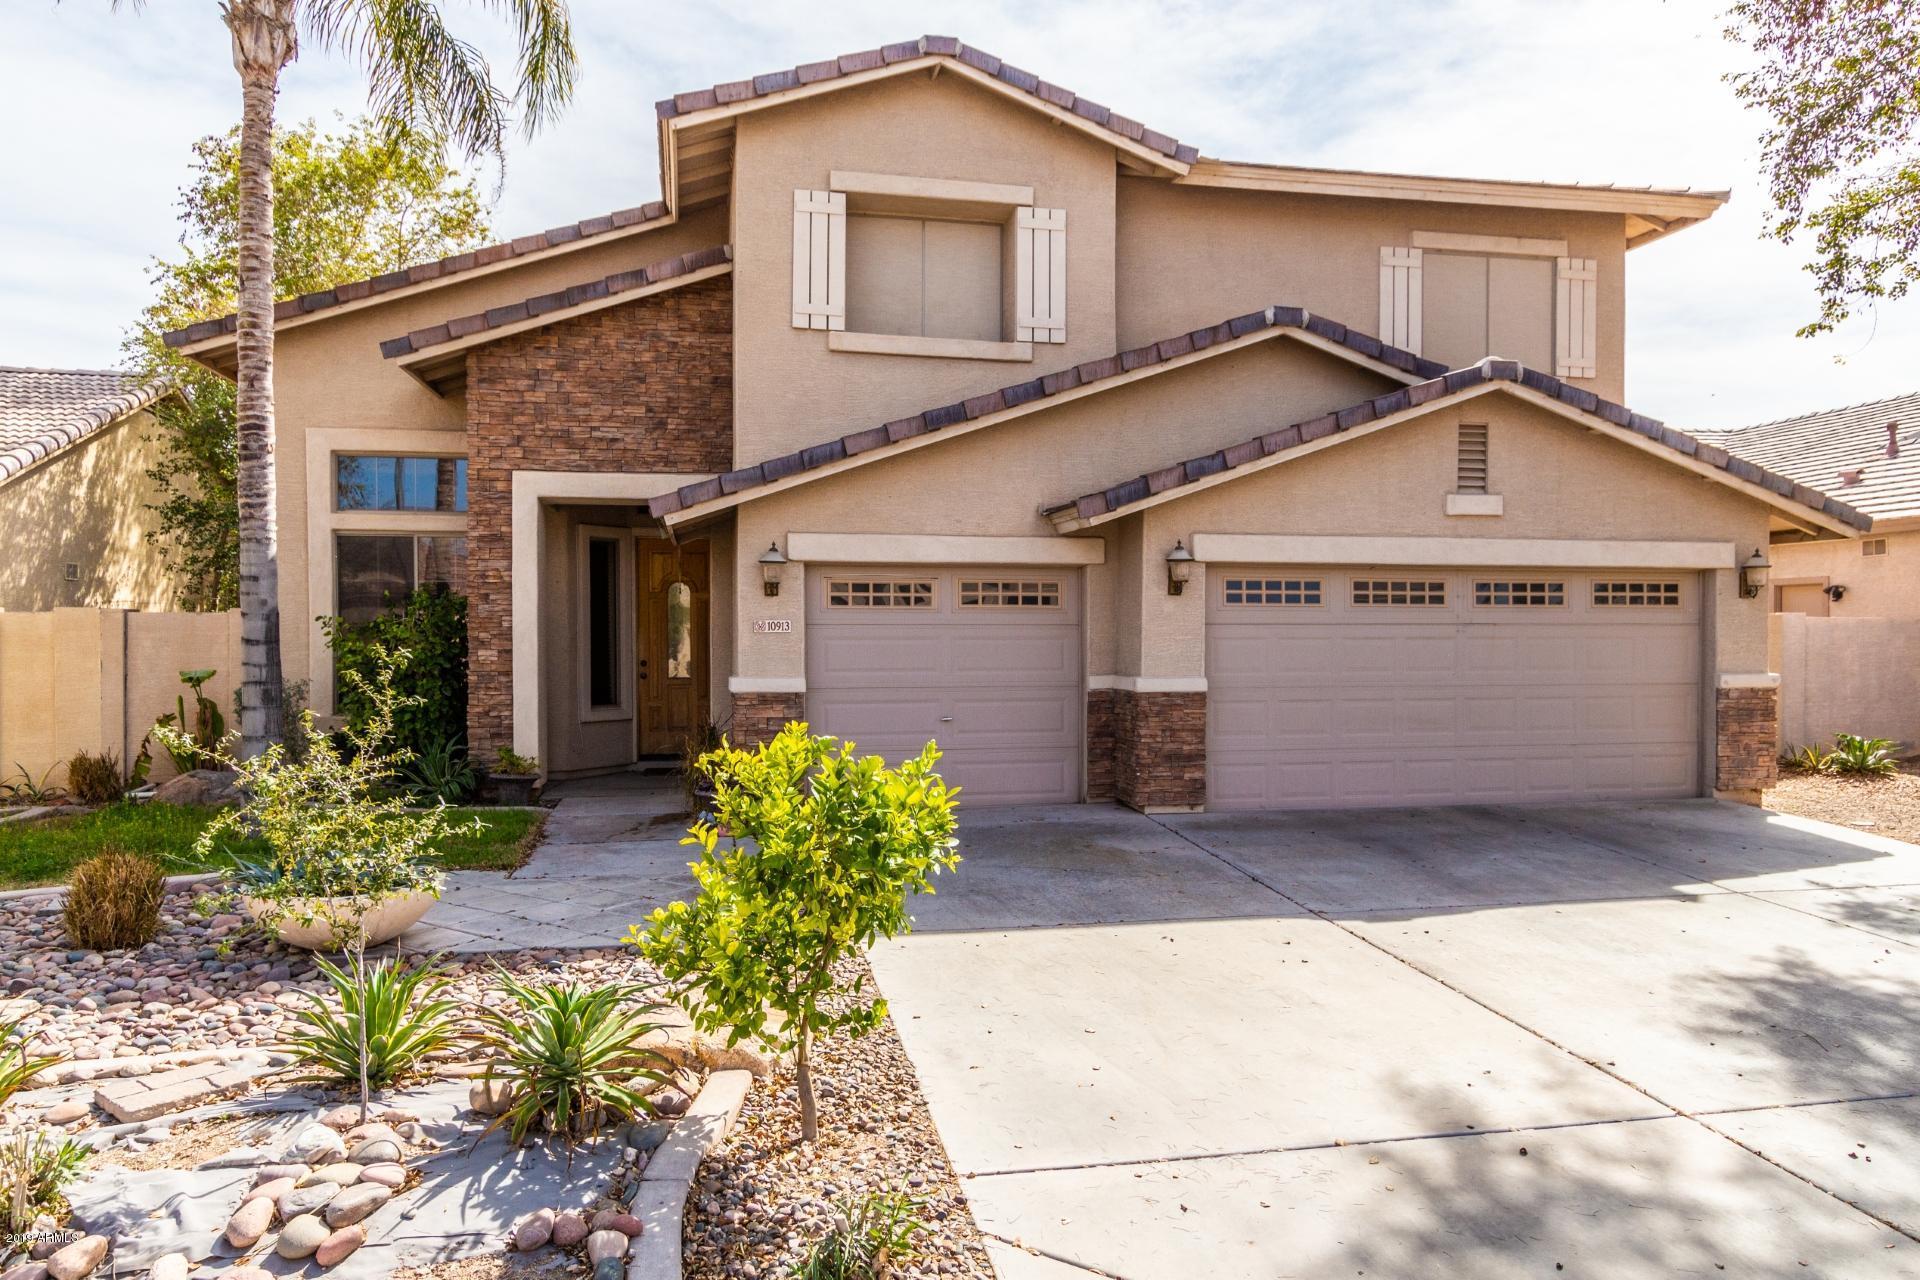 Photo of 10913 W LOCUST Lane, Avondale, AZ 85323